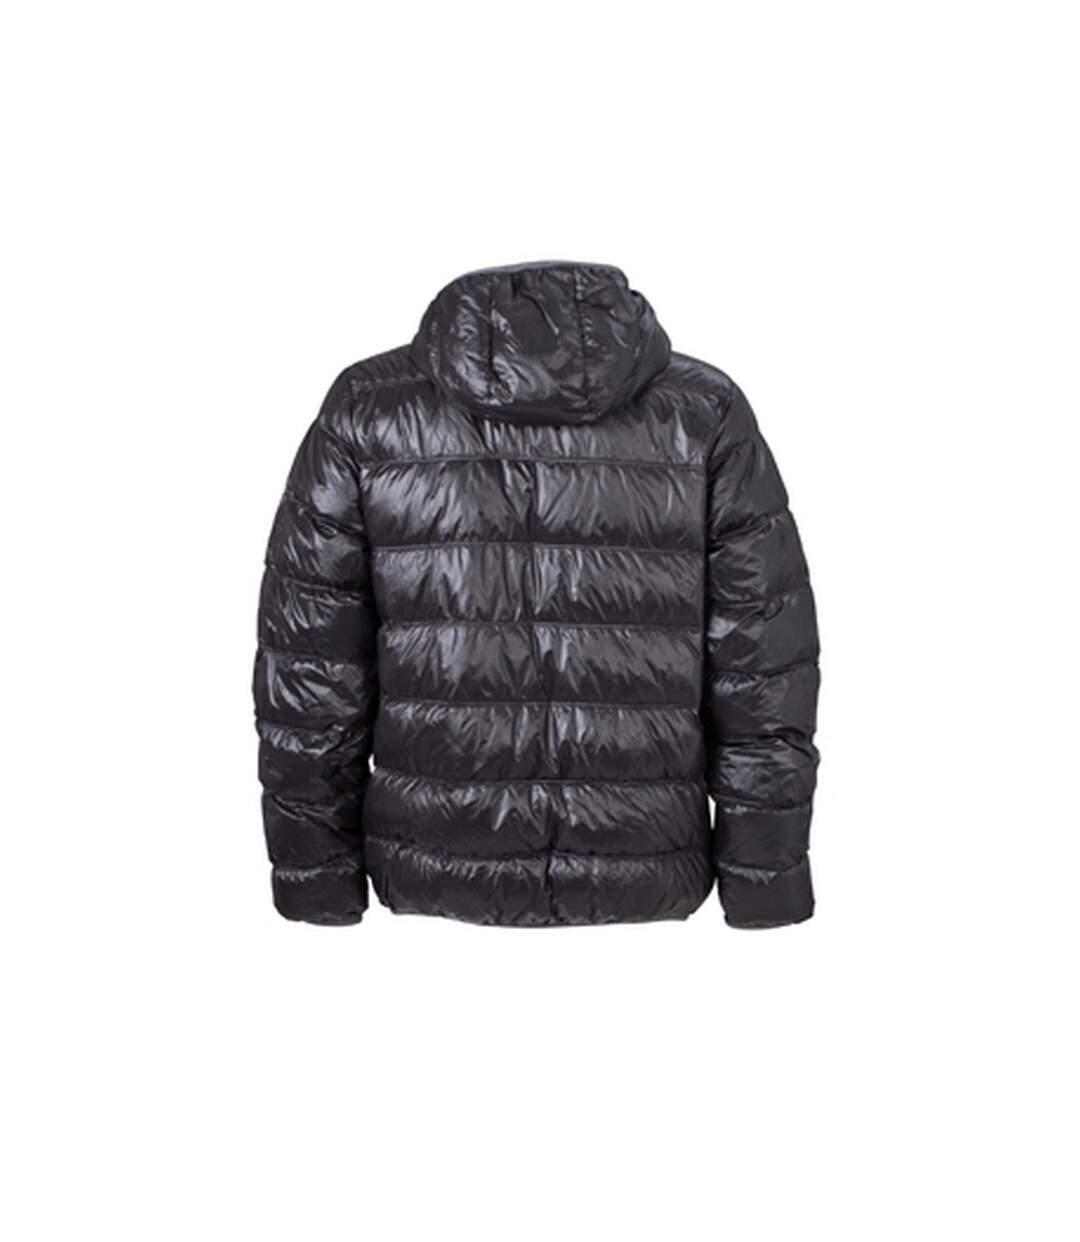 James and Nicholson Mens Down Jacket (Black/Grey) - UTFU229